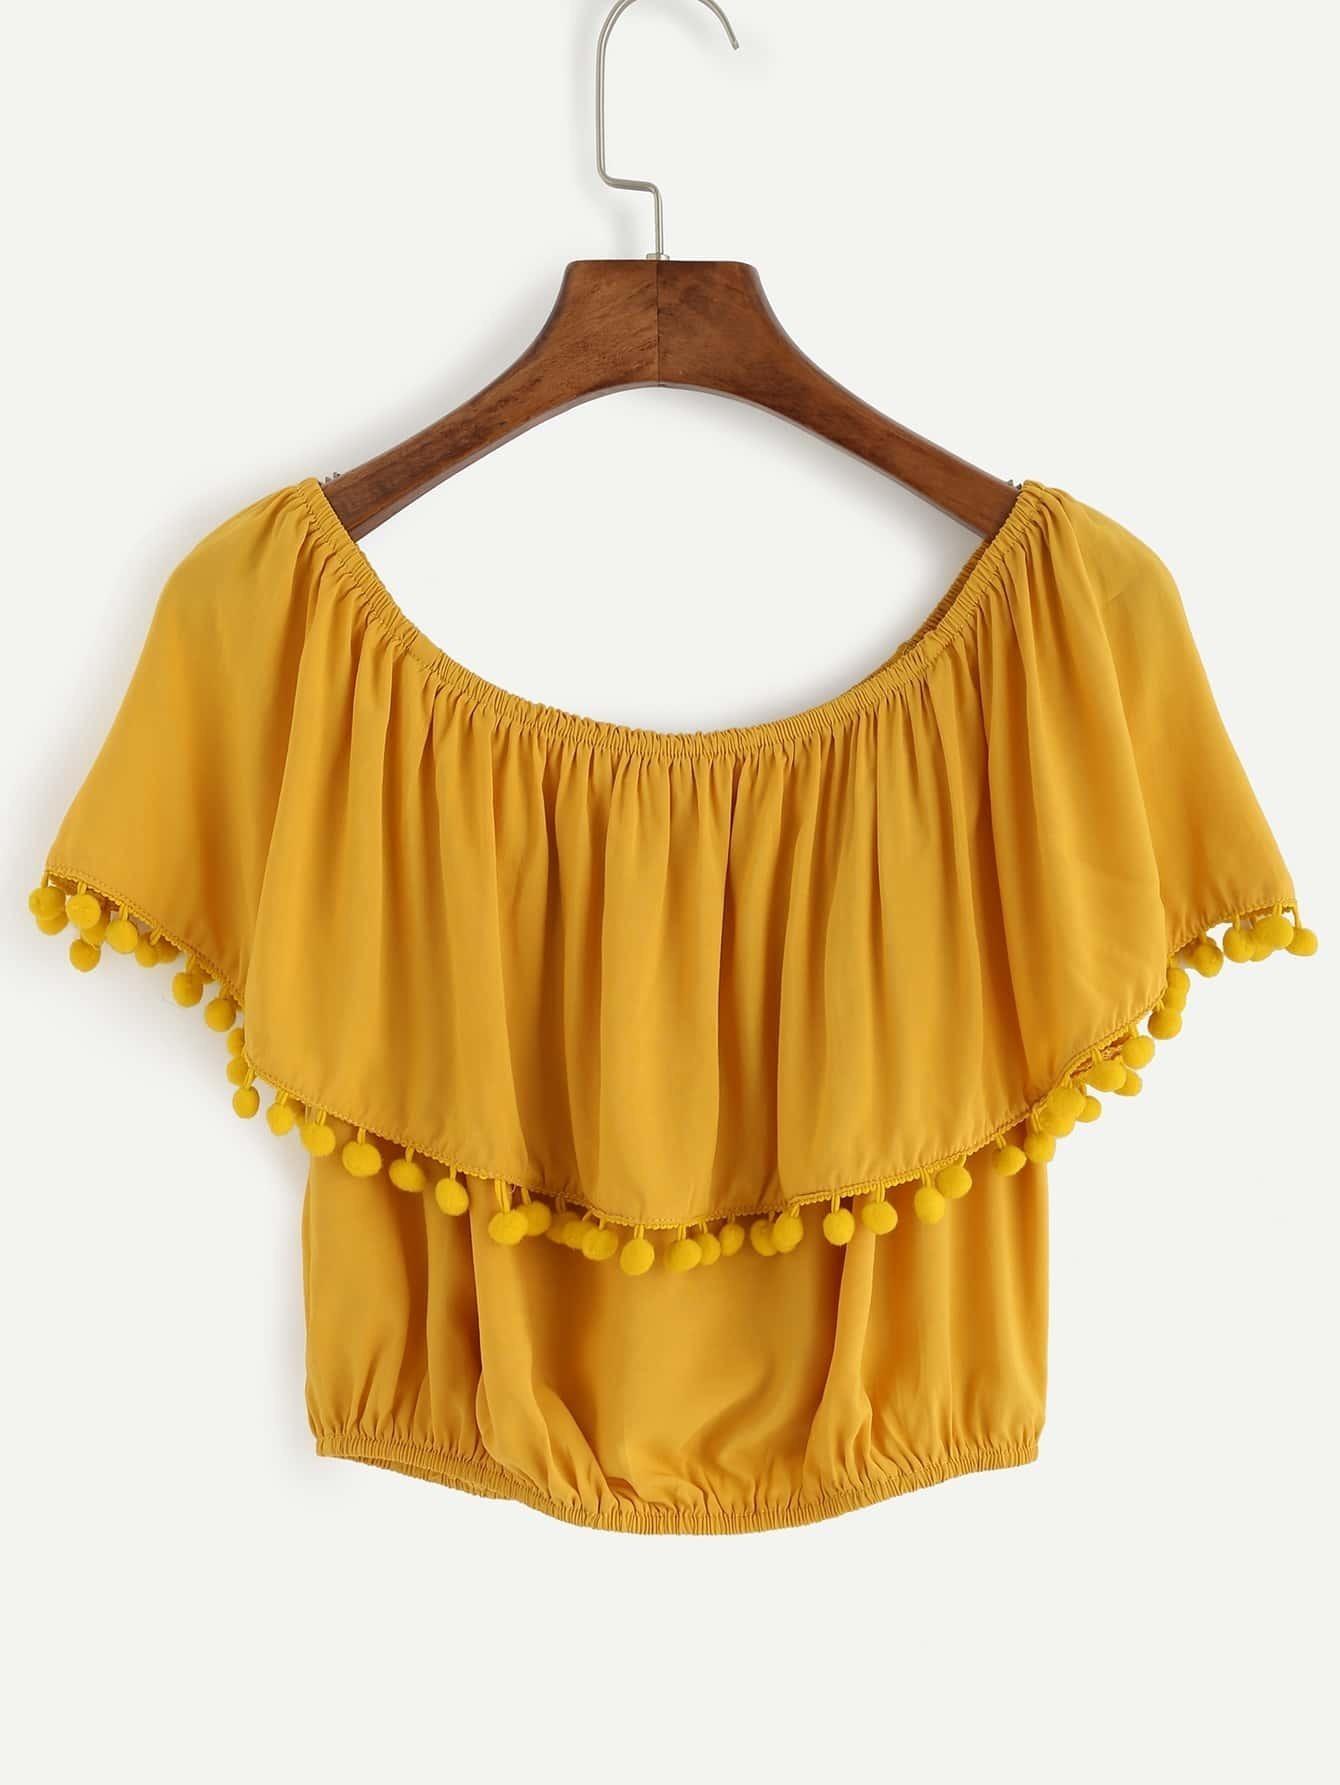 78ddc526ecf37d Yellow Pom Pom Trim Ruffle Off The Shoulder Top EmmaCloth-Women Fast  Fashion Online